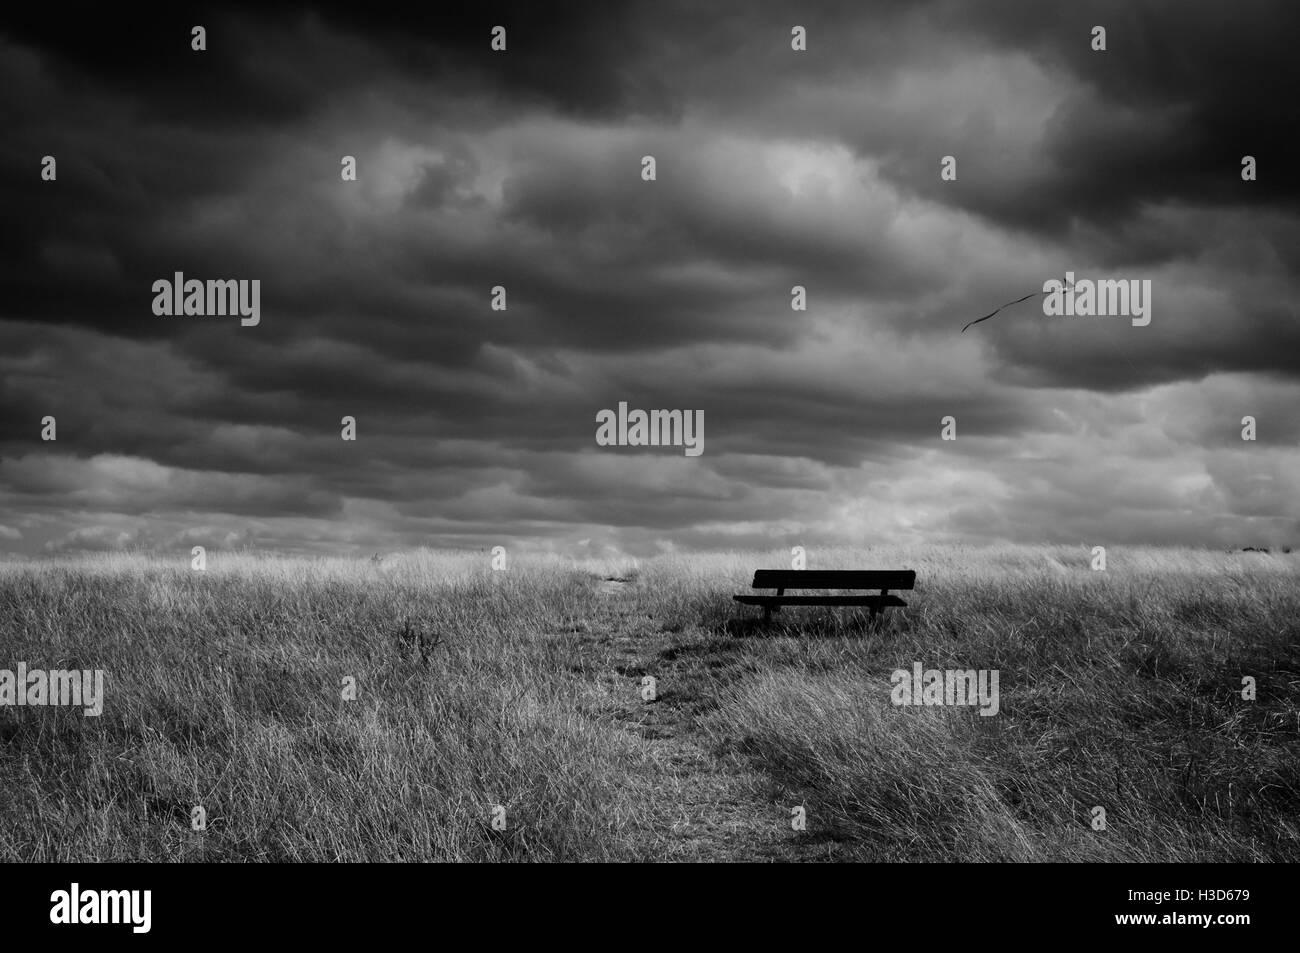 Hampstead Heath park in London. - Stock Image